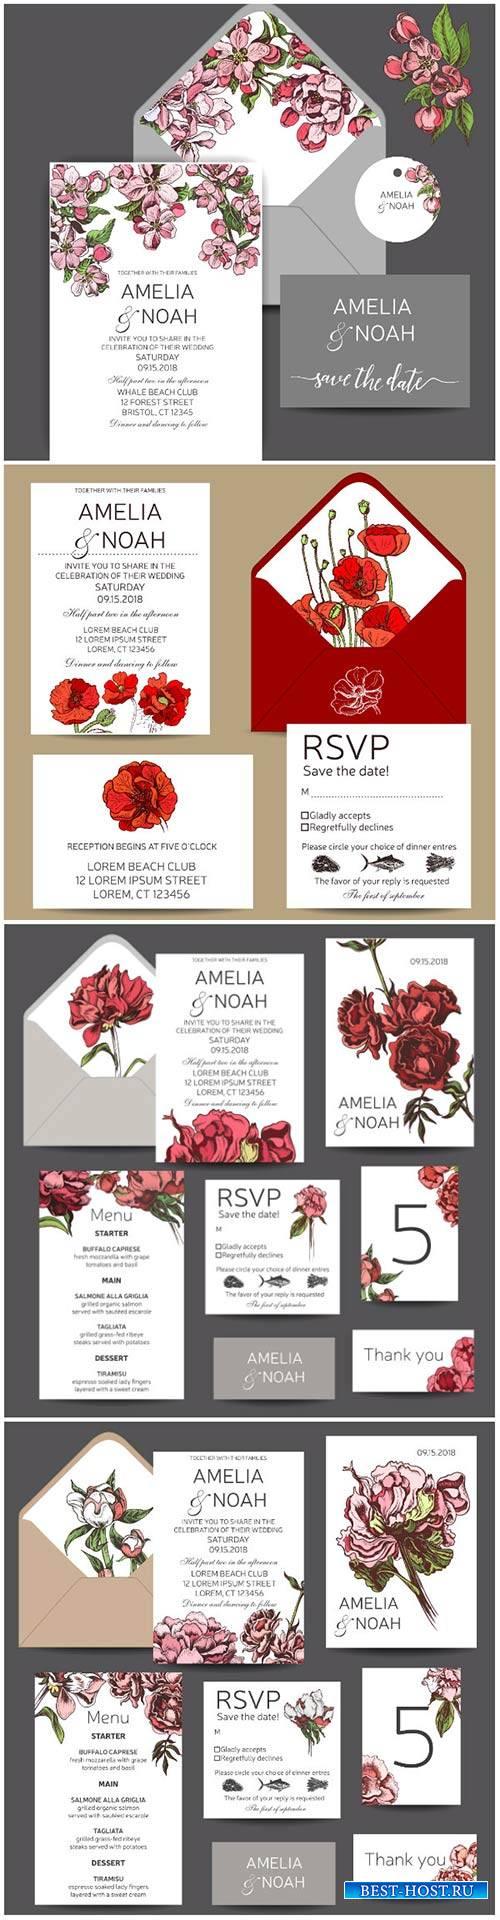 Vector template for wedding invitation